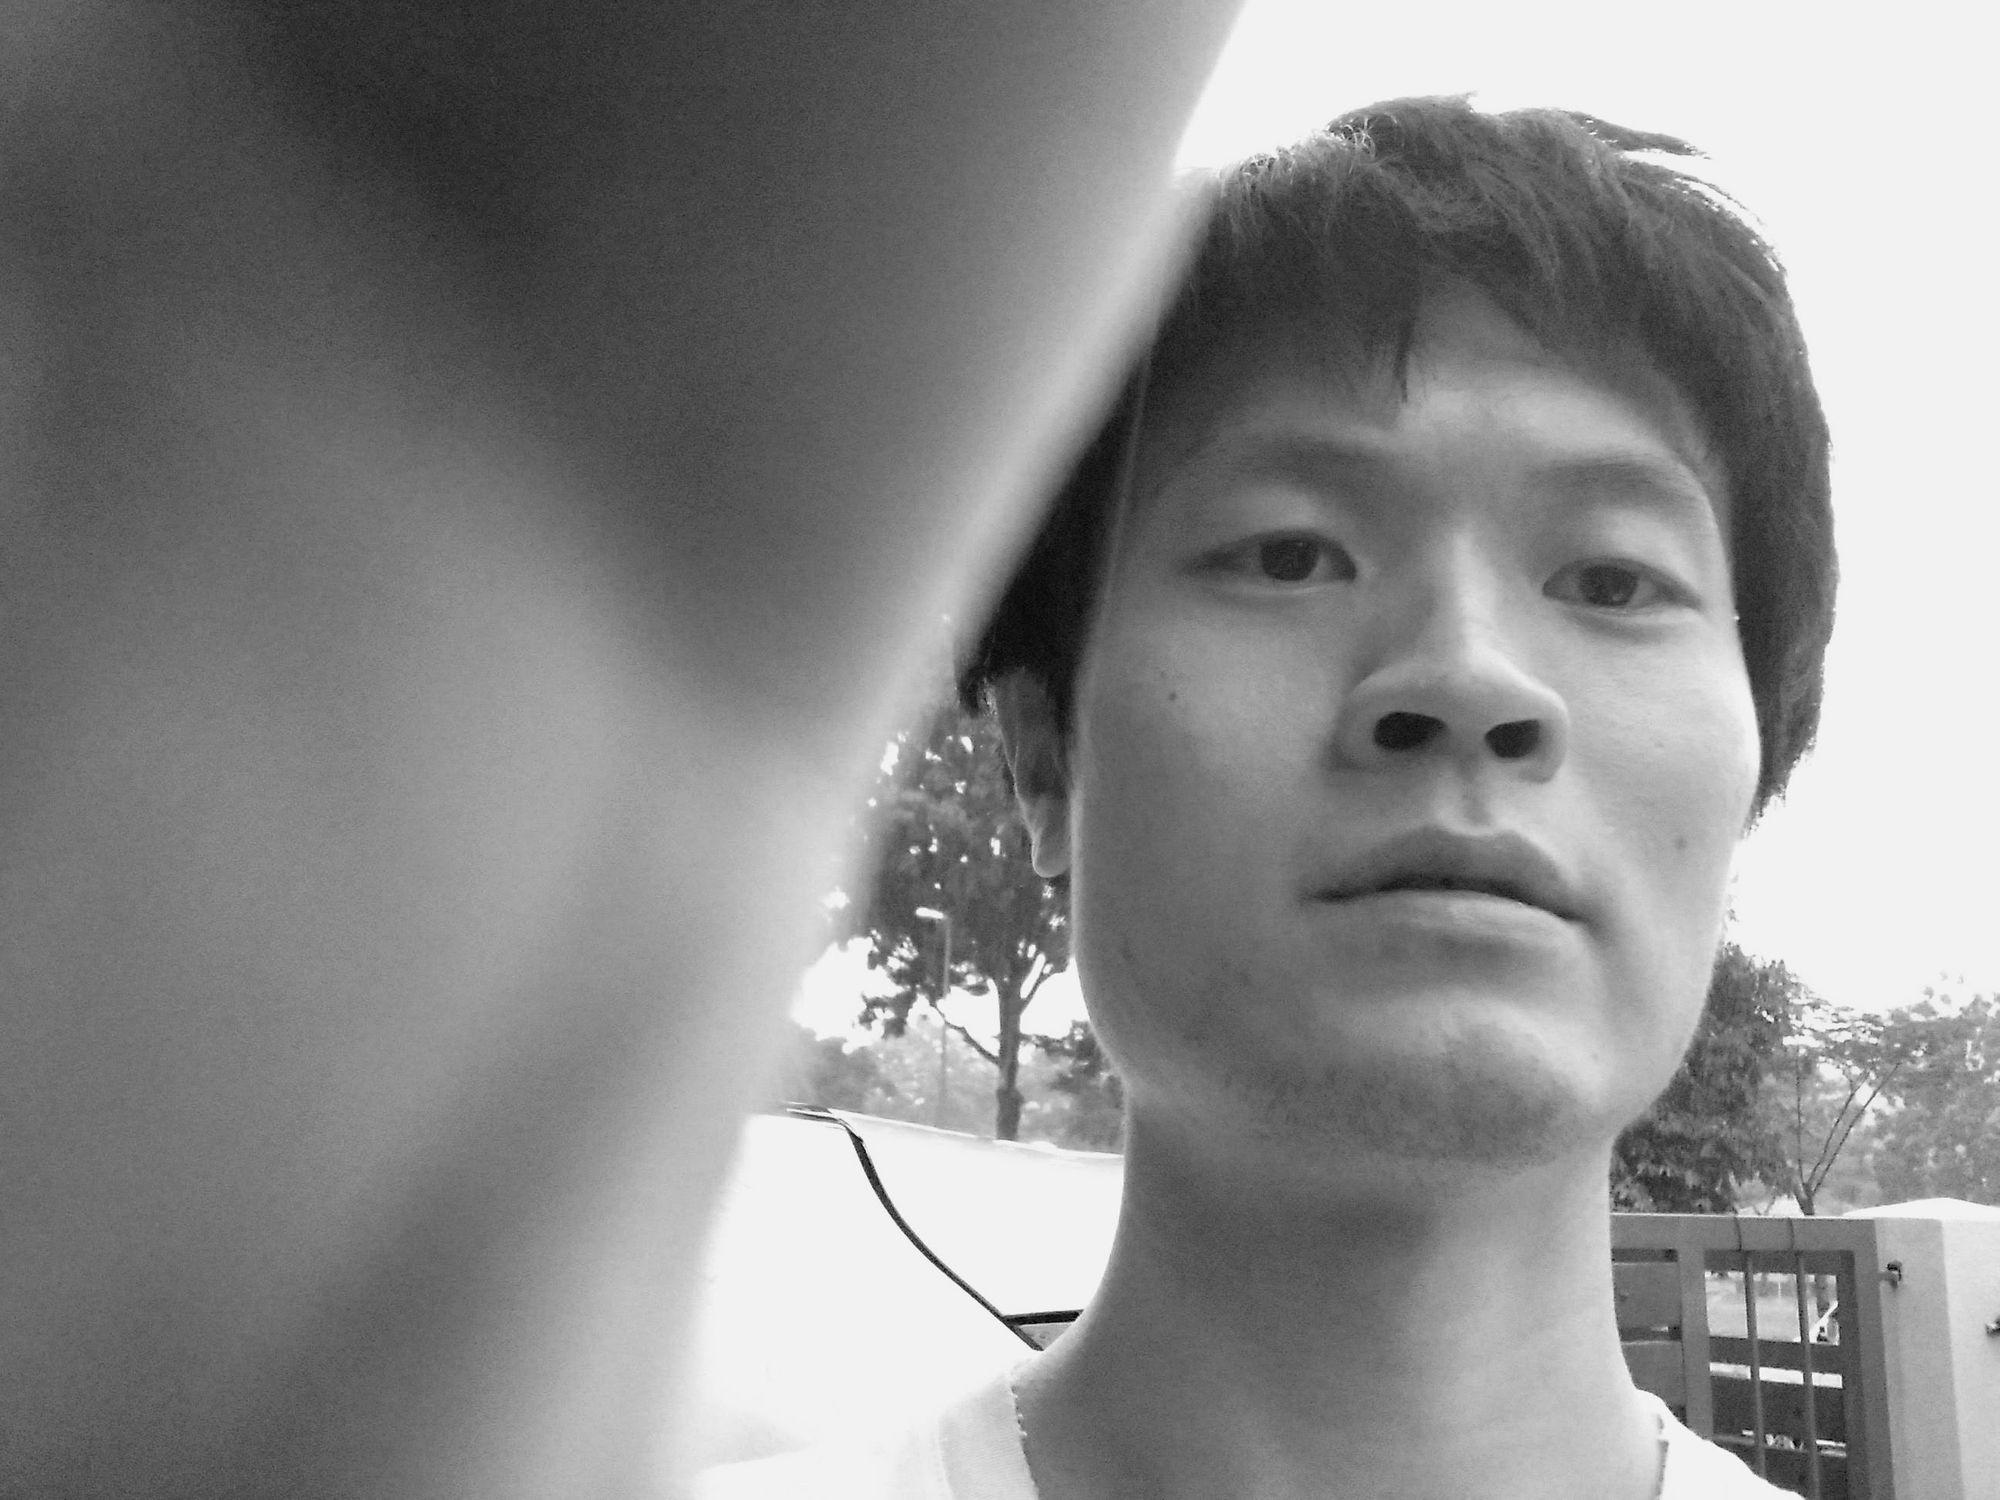 Kheoh Yee Wei